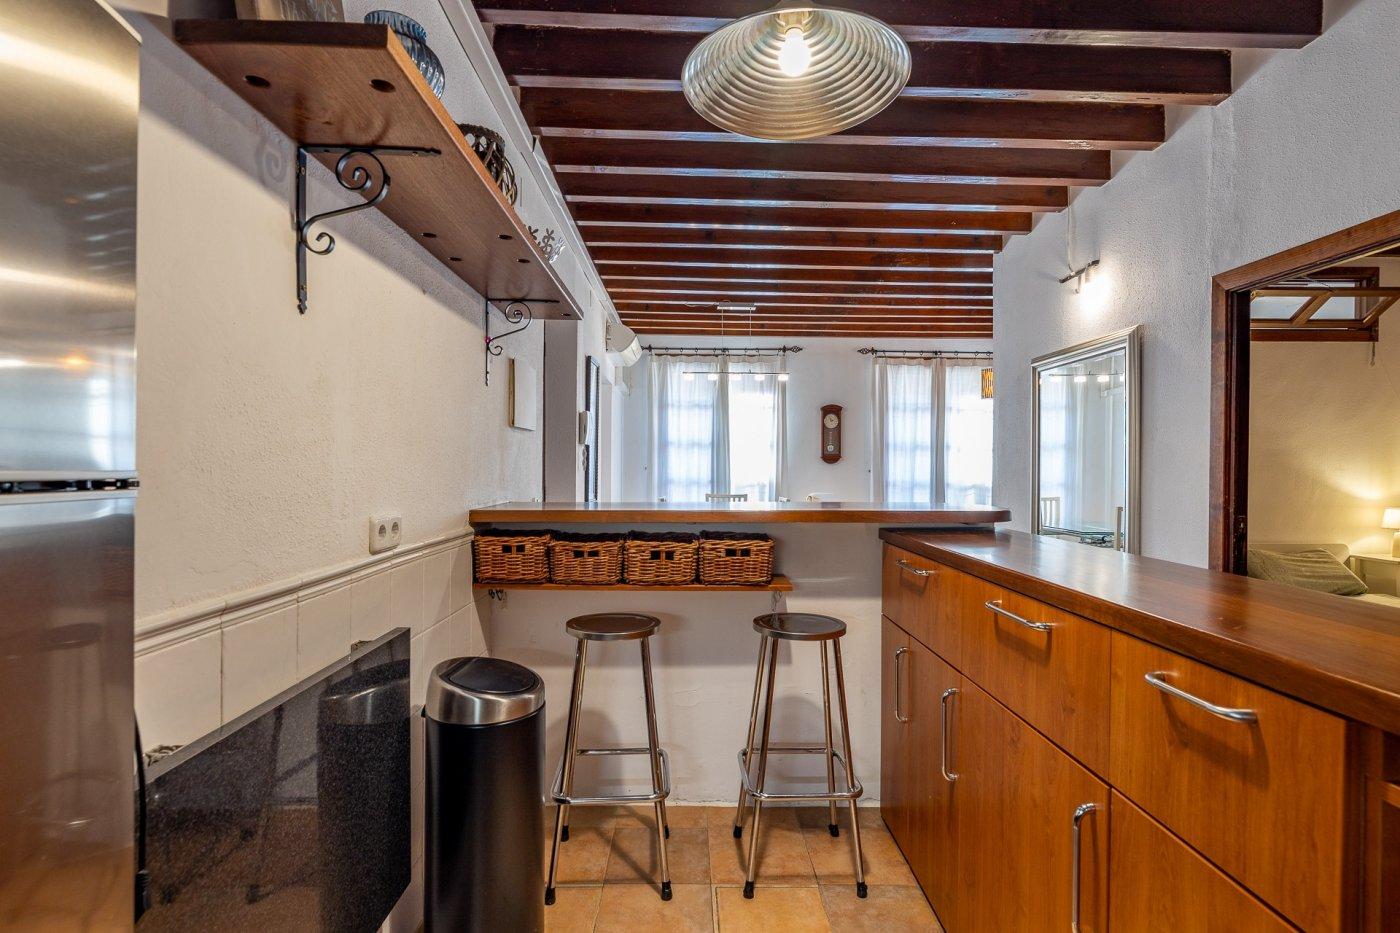 Espectacular apartamento en centro de palma - imagenInmueble30